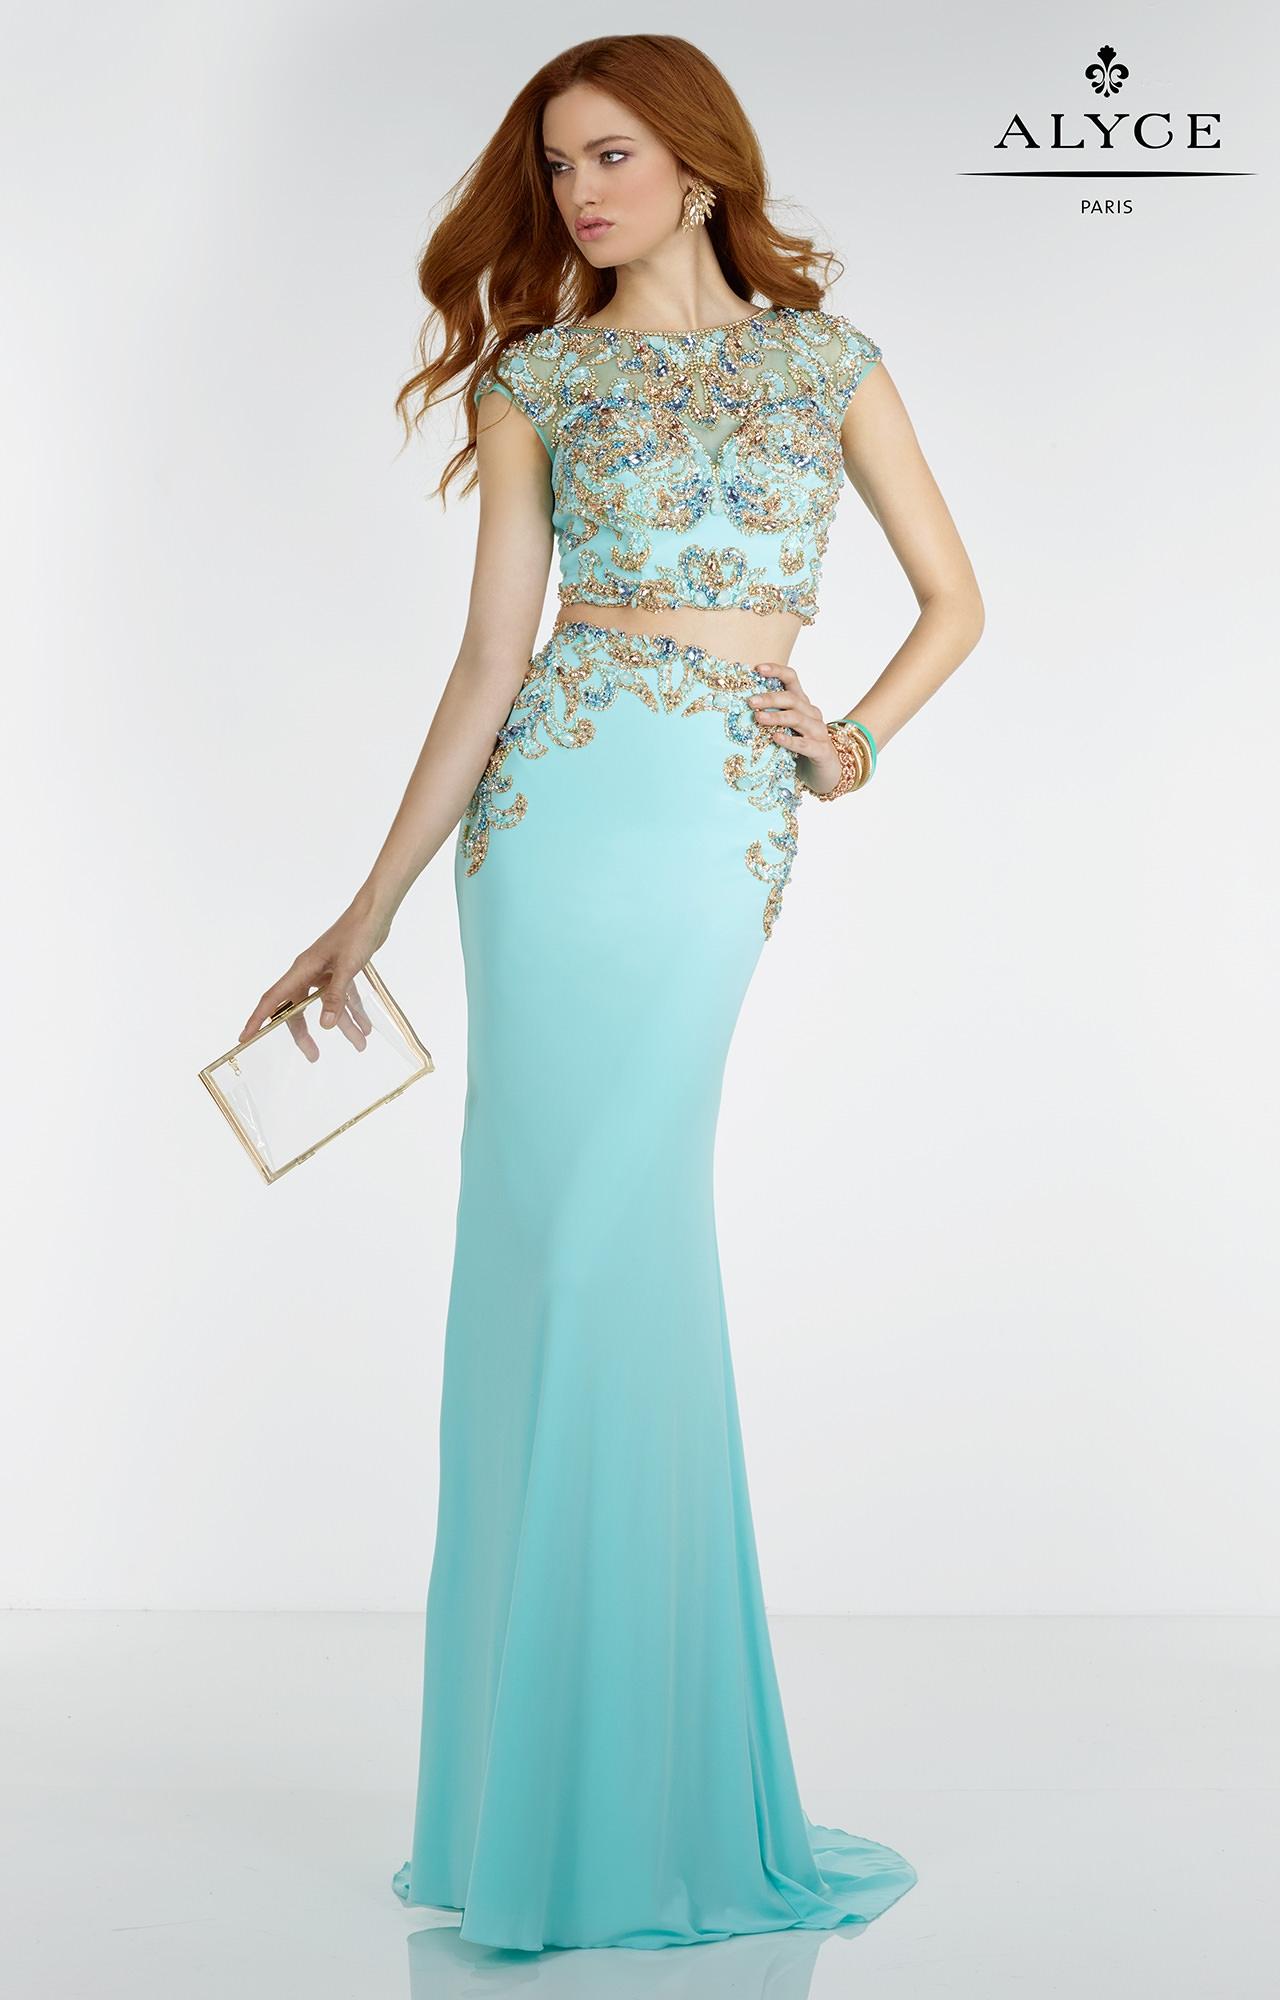 Alyce Paris 6512 - A Night To Remember Dress Prom Dress